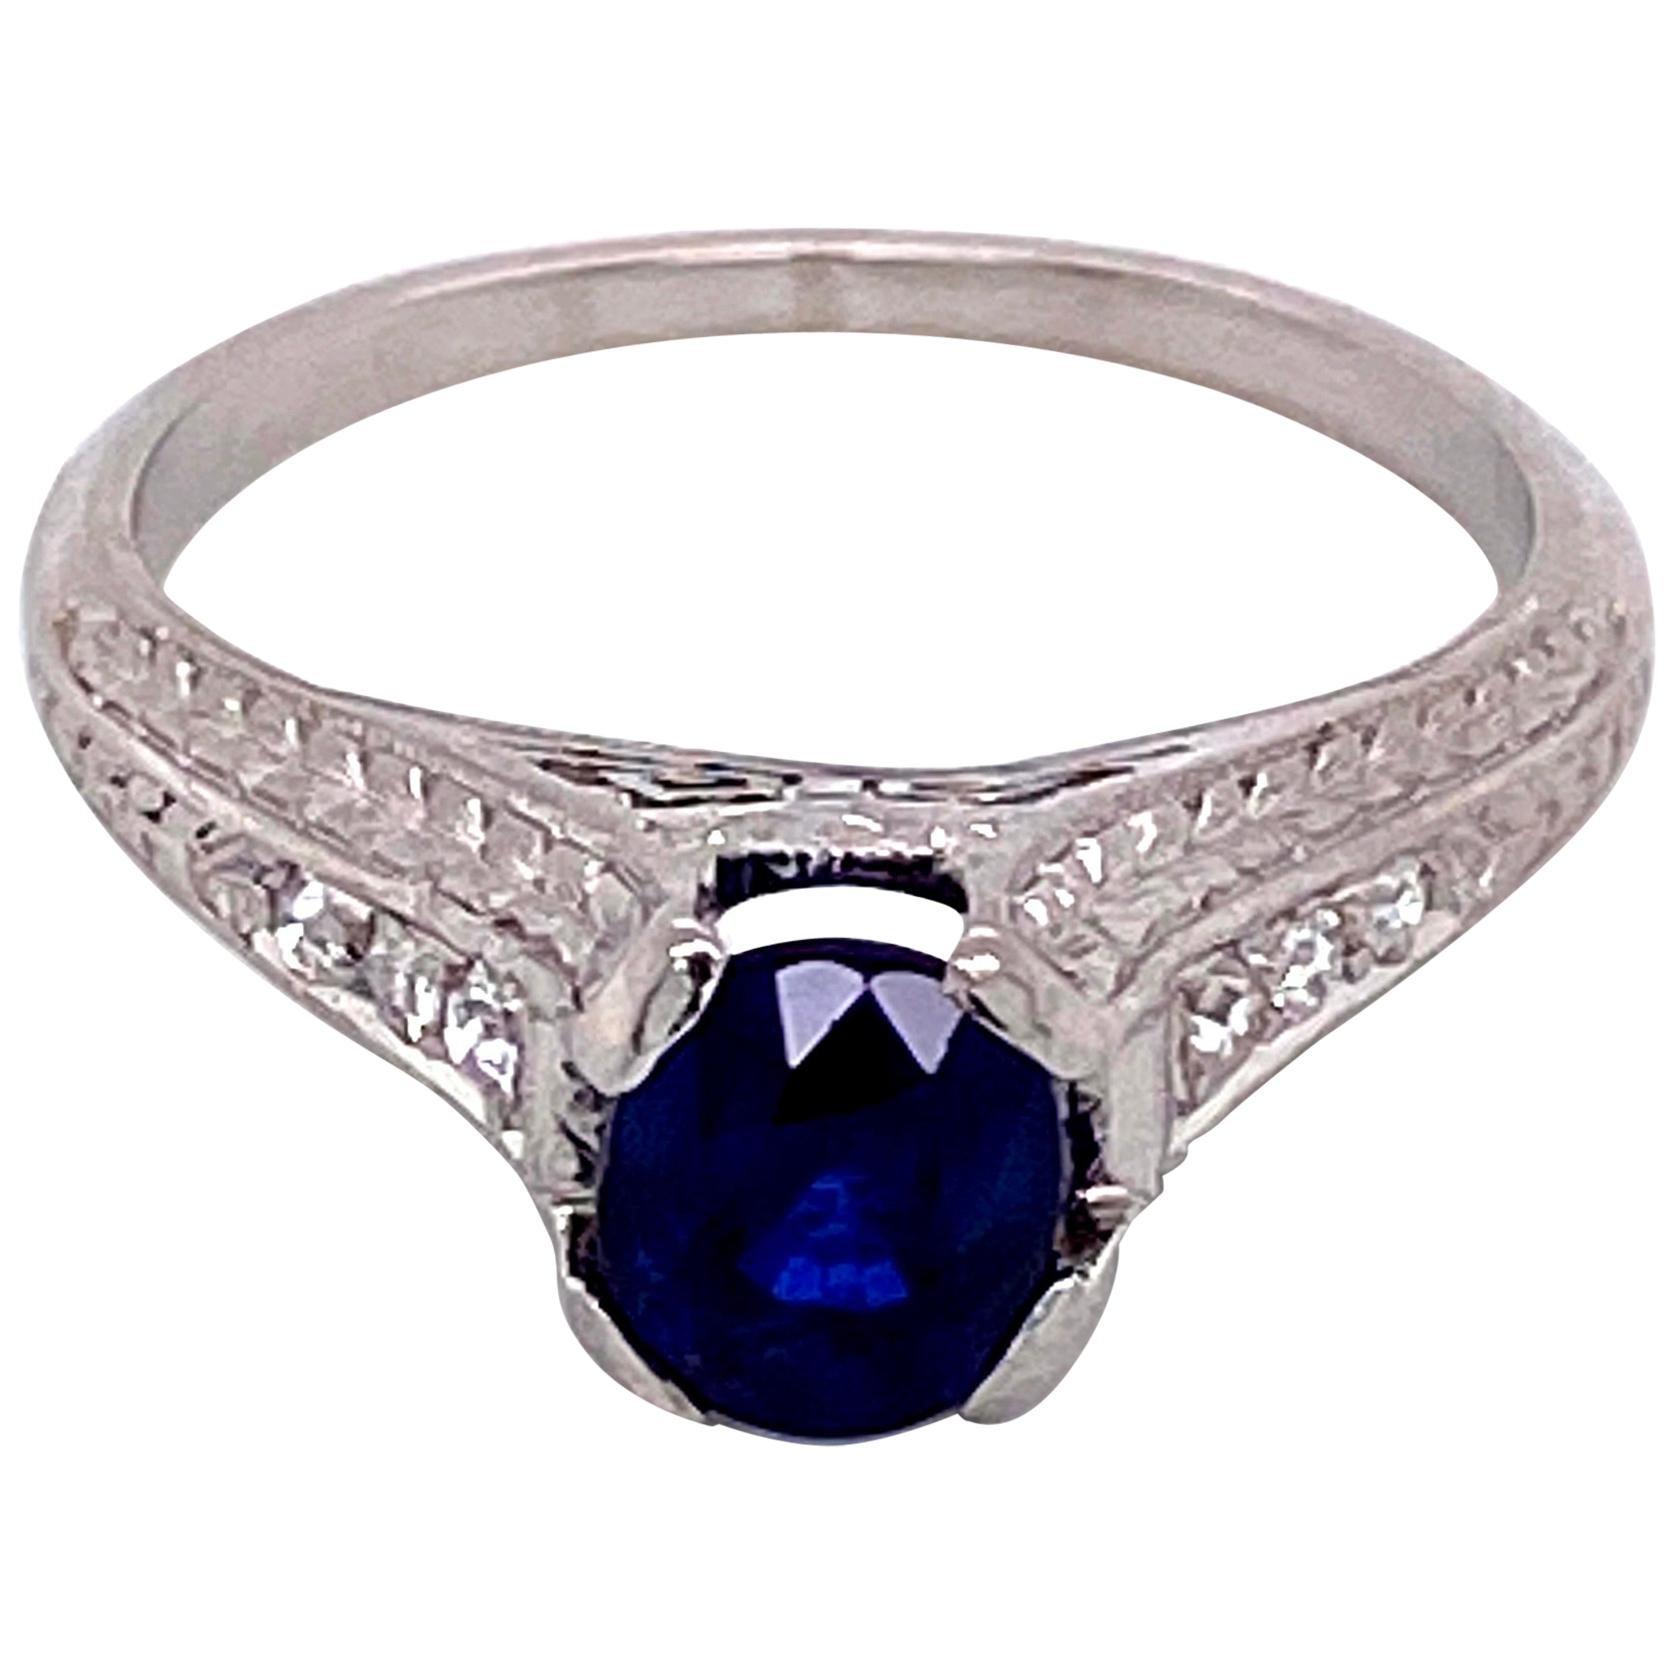 1.05 Carat Sapphire and Diamond Platinum Art Deco Style Ring Fine Estate Jewelry